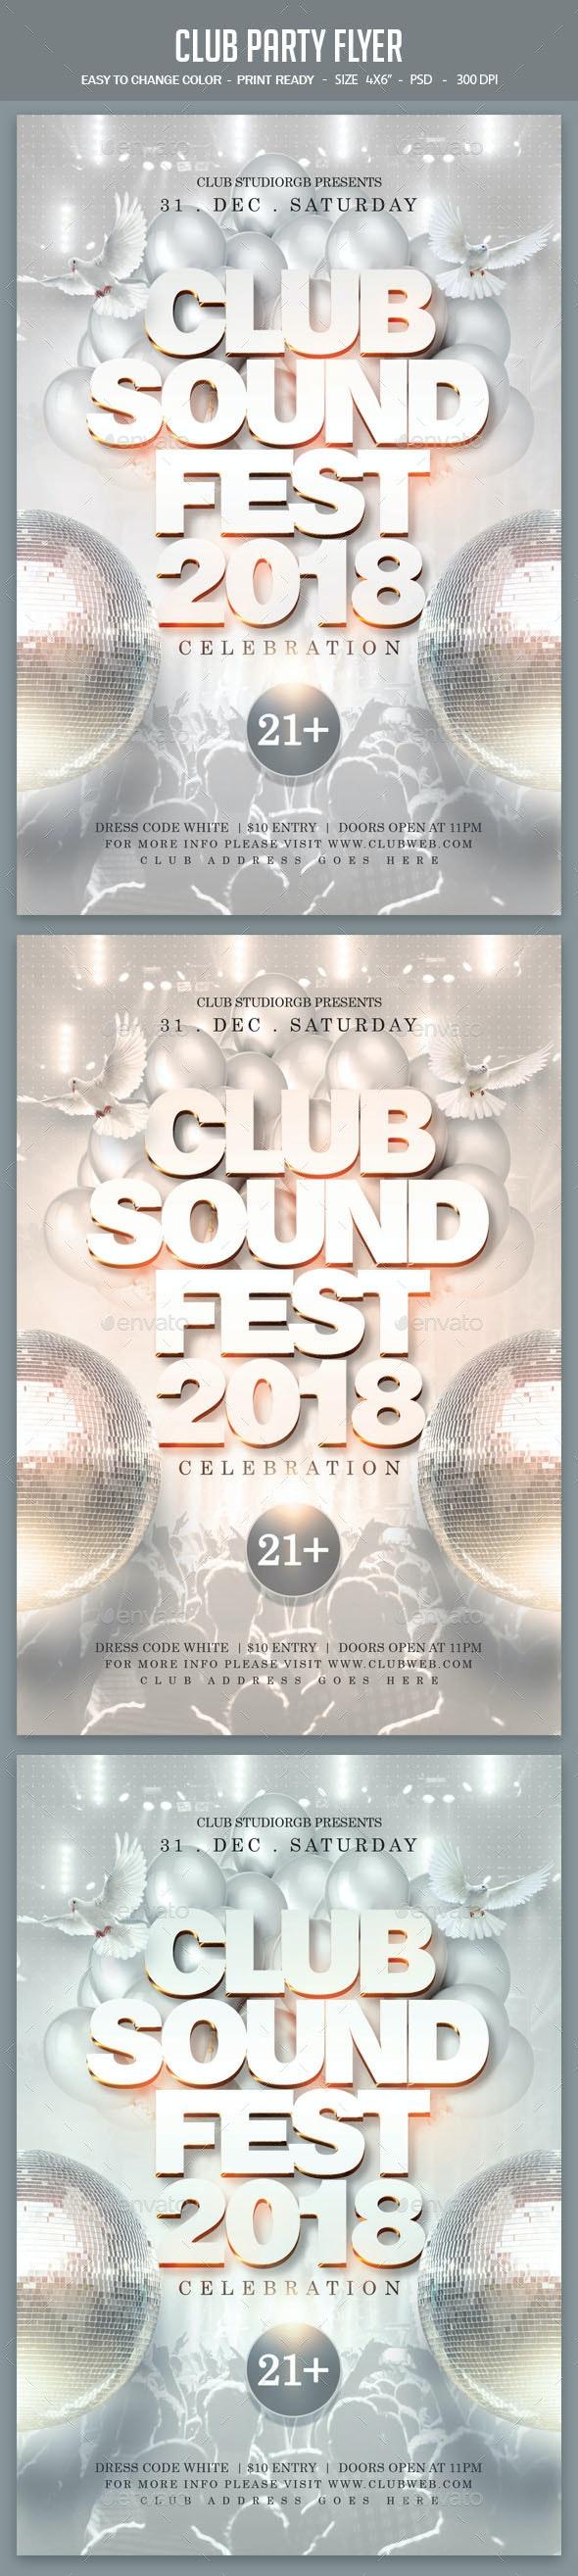 فایل لایه باز بنر Club Party Flyer